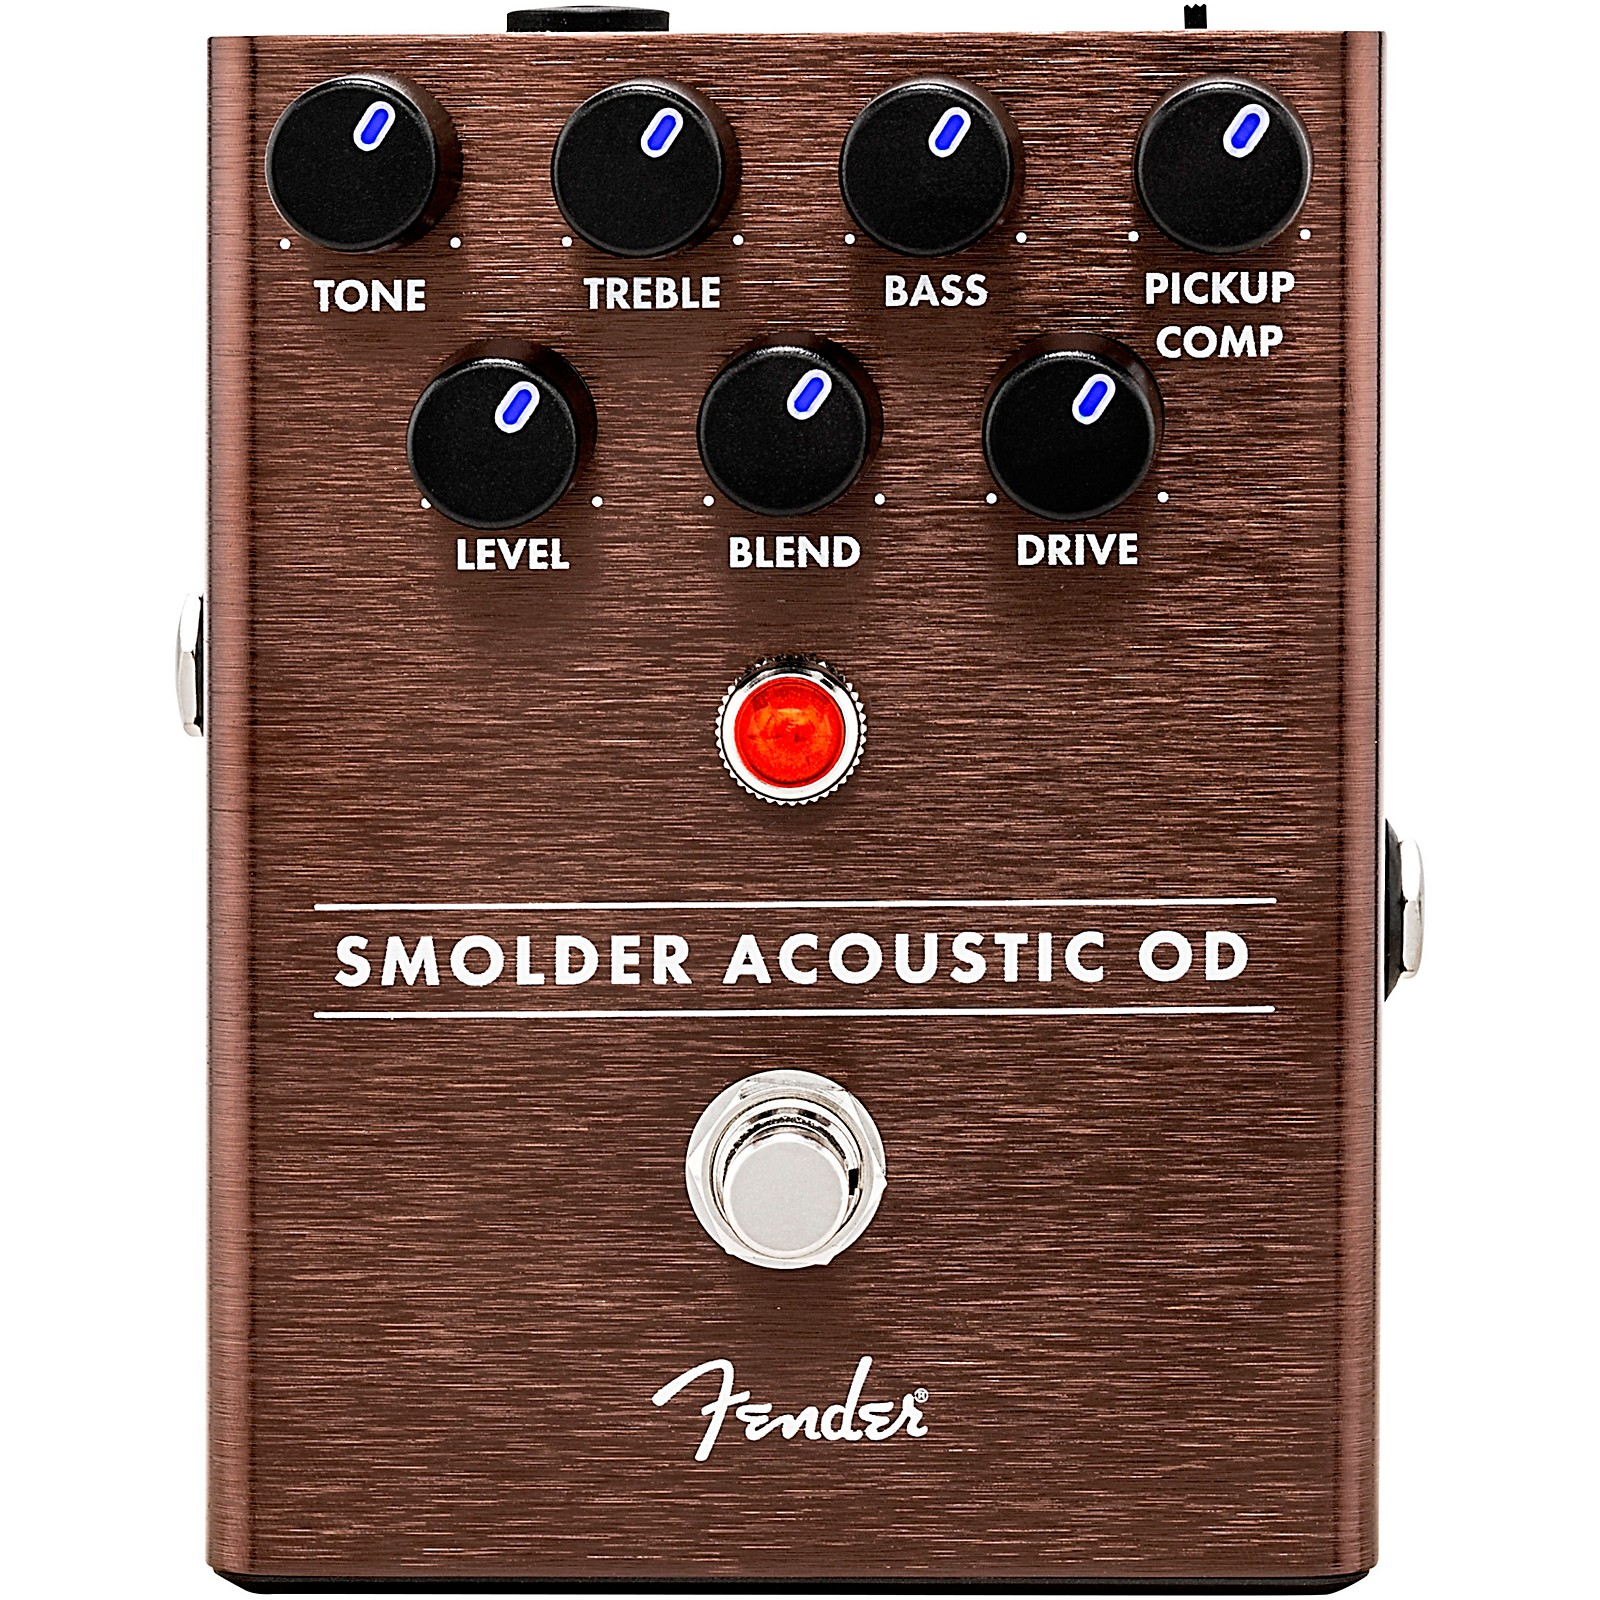 Fender Smolder Acoustic Overdrive Effects Pedal